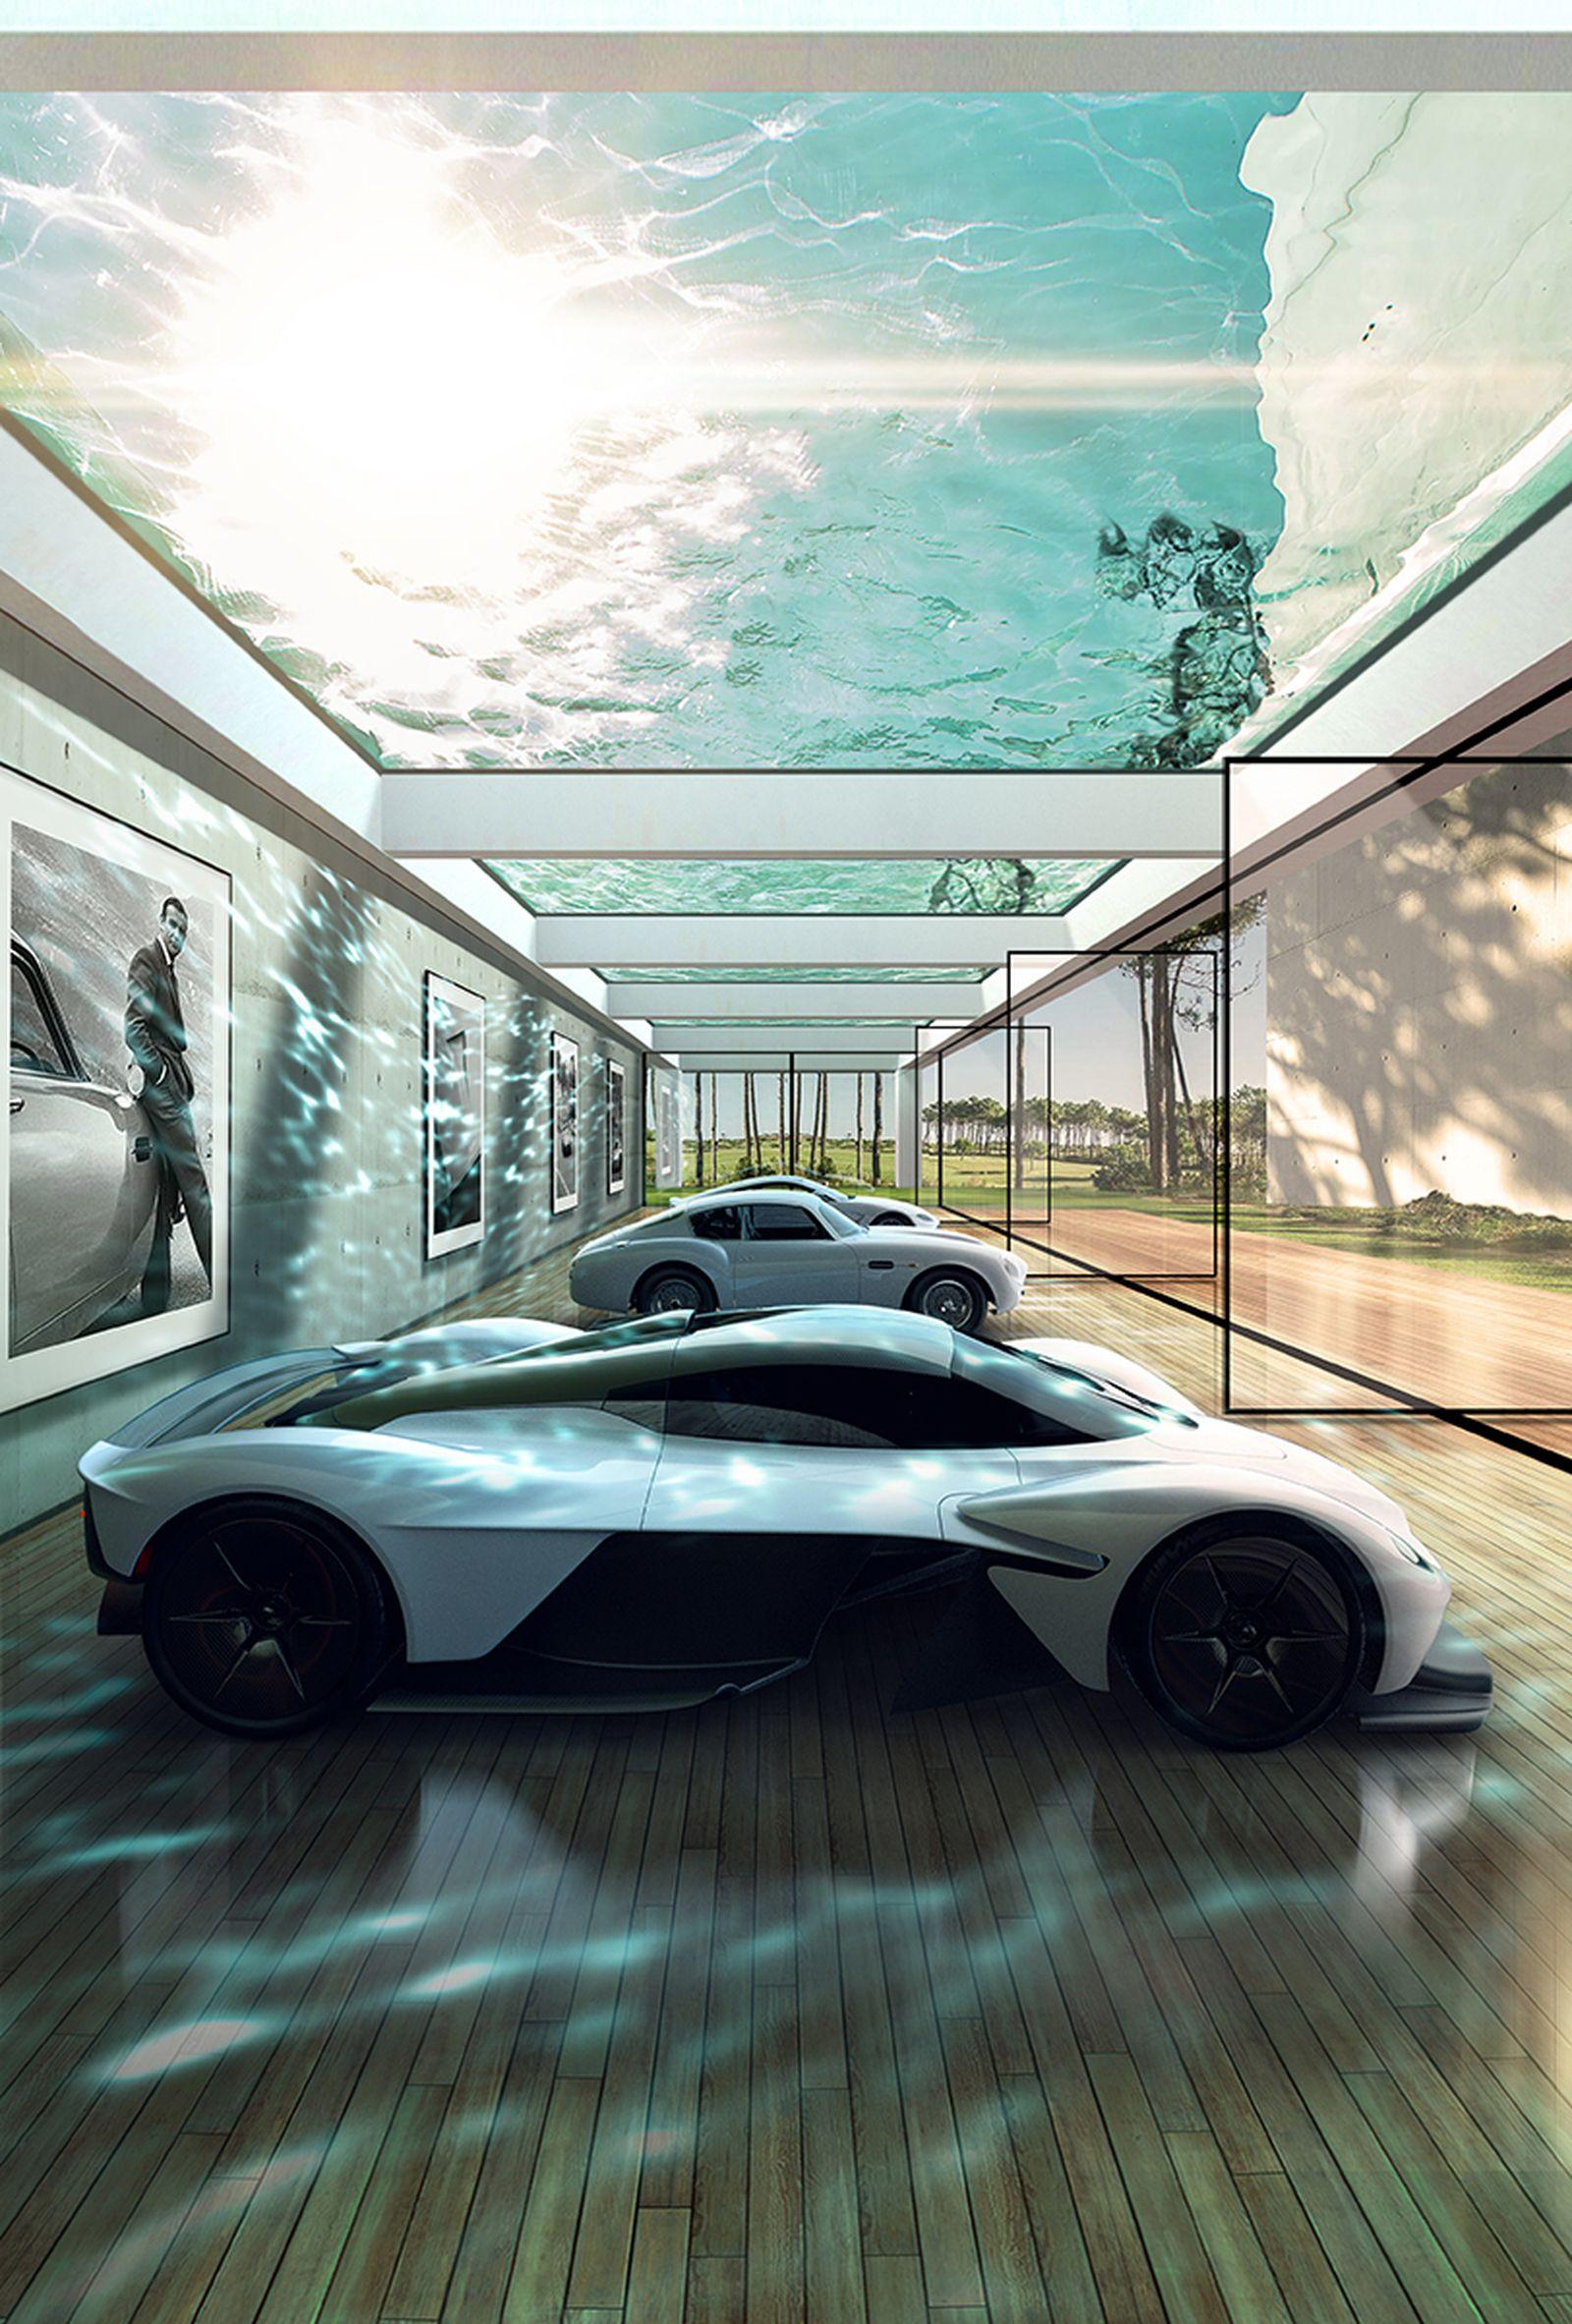 Aston Martin Announces Bespoke Garage Design Service